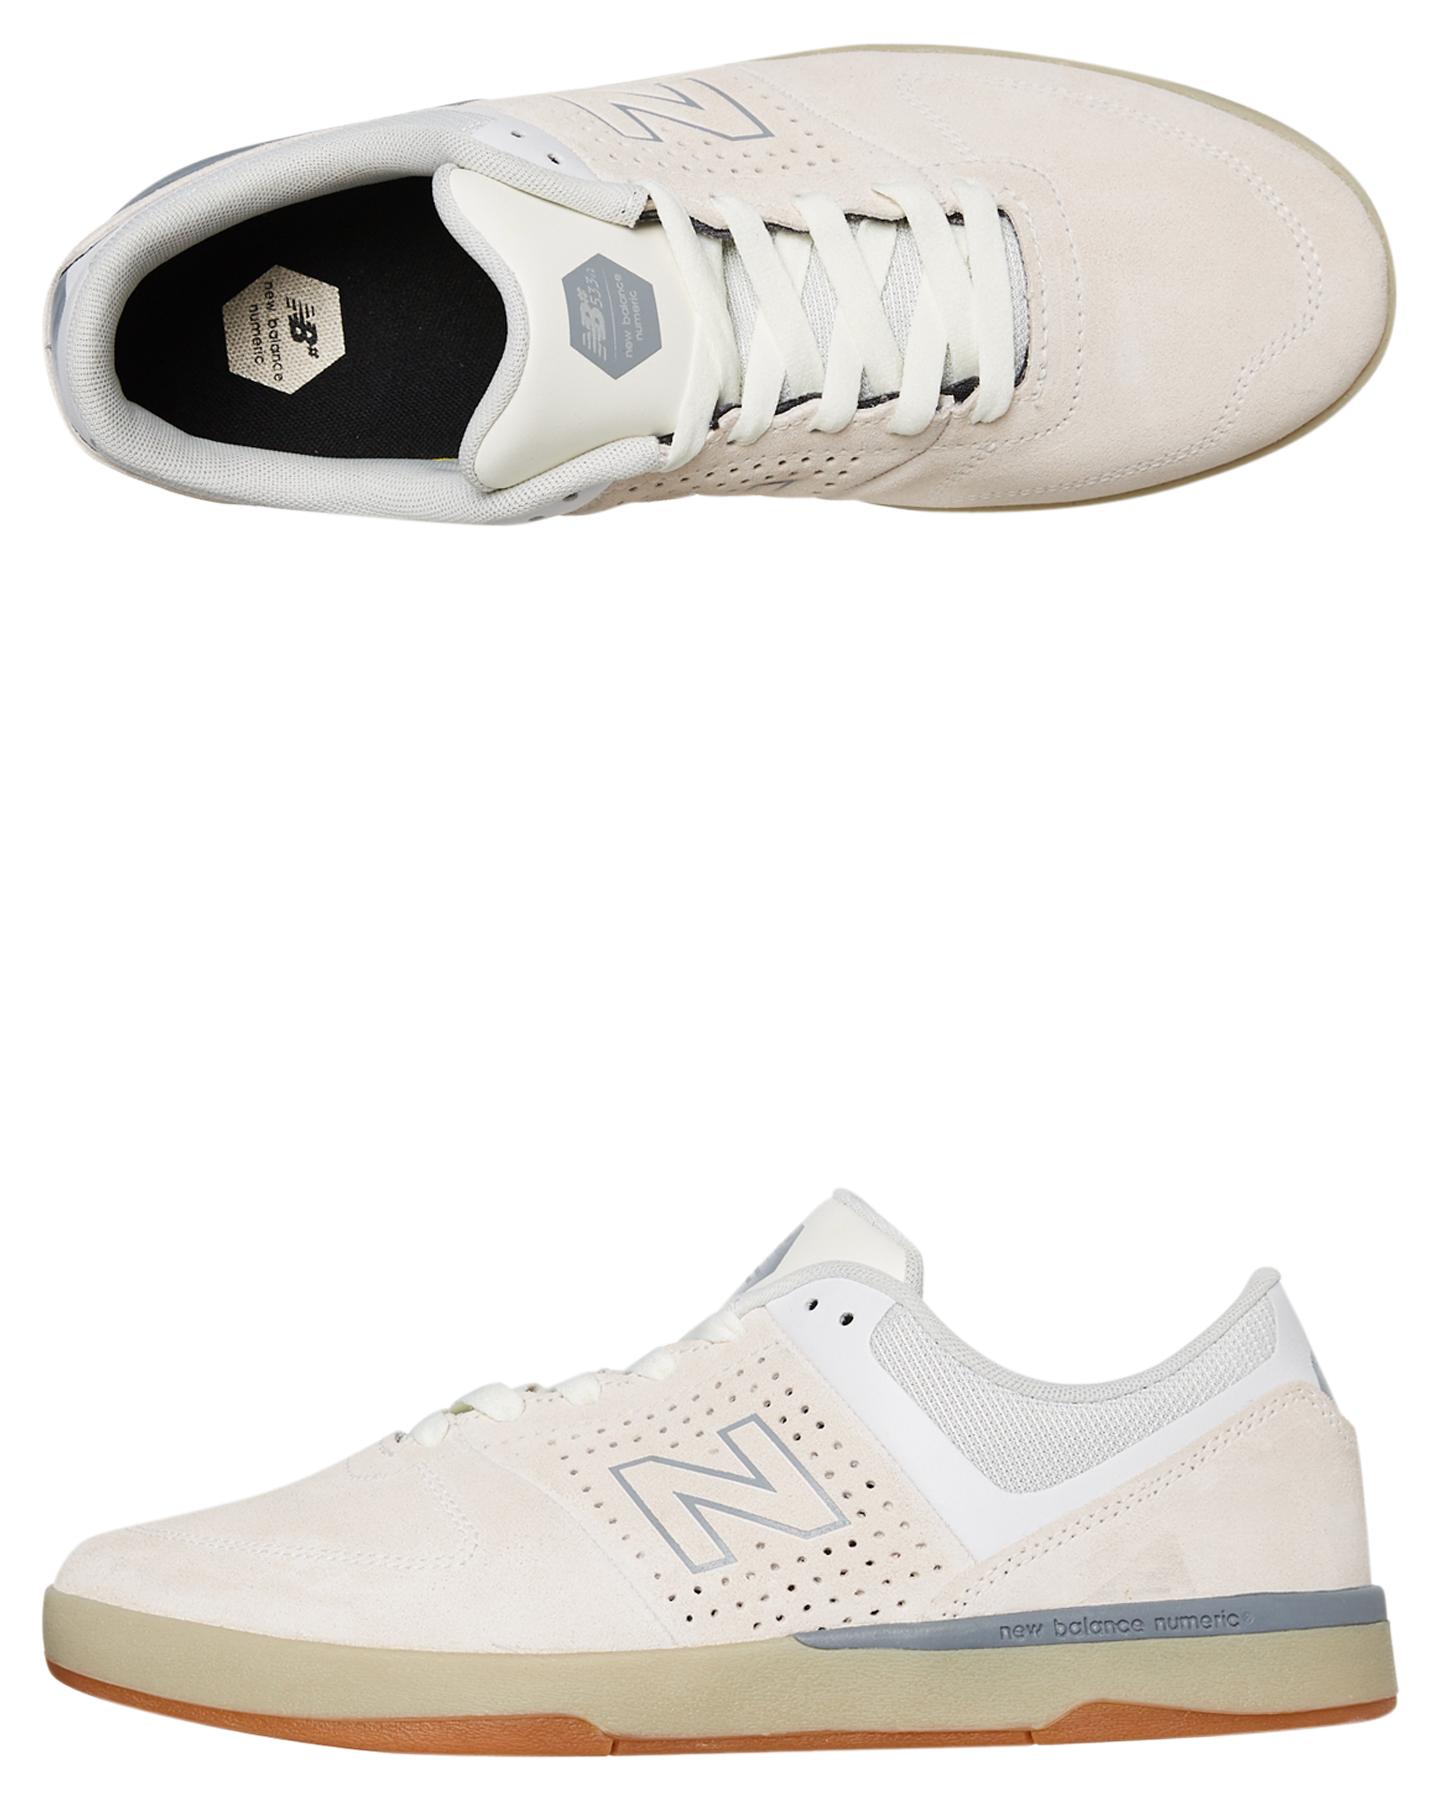 hohe Qualität unverwechselbarer Stil attraktiv und langlebig New Balance 533 Mens Shoe Sea Salt Sea Salt Shoes Size 9 ...